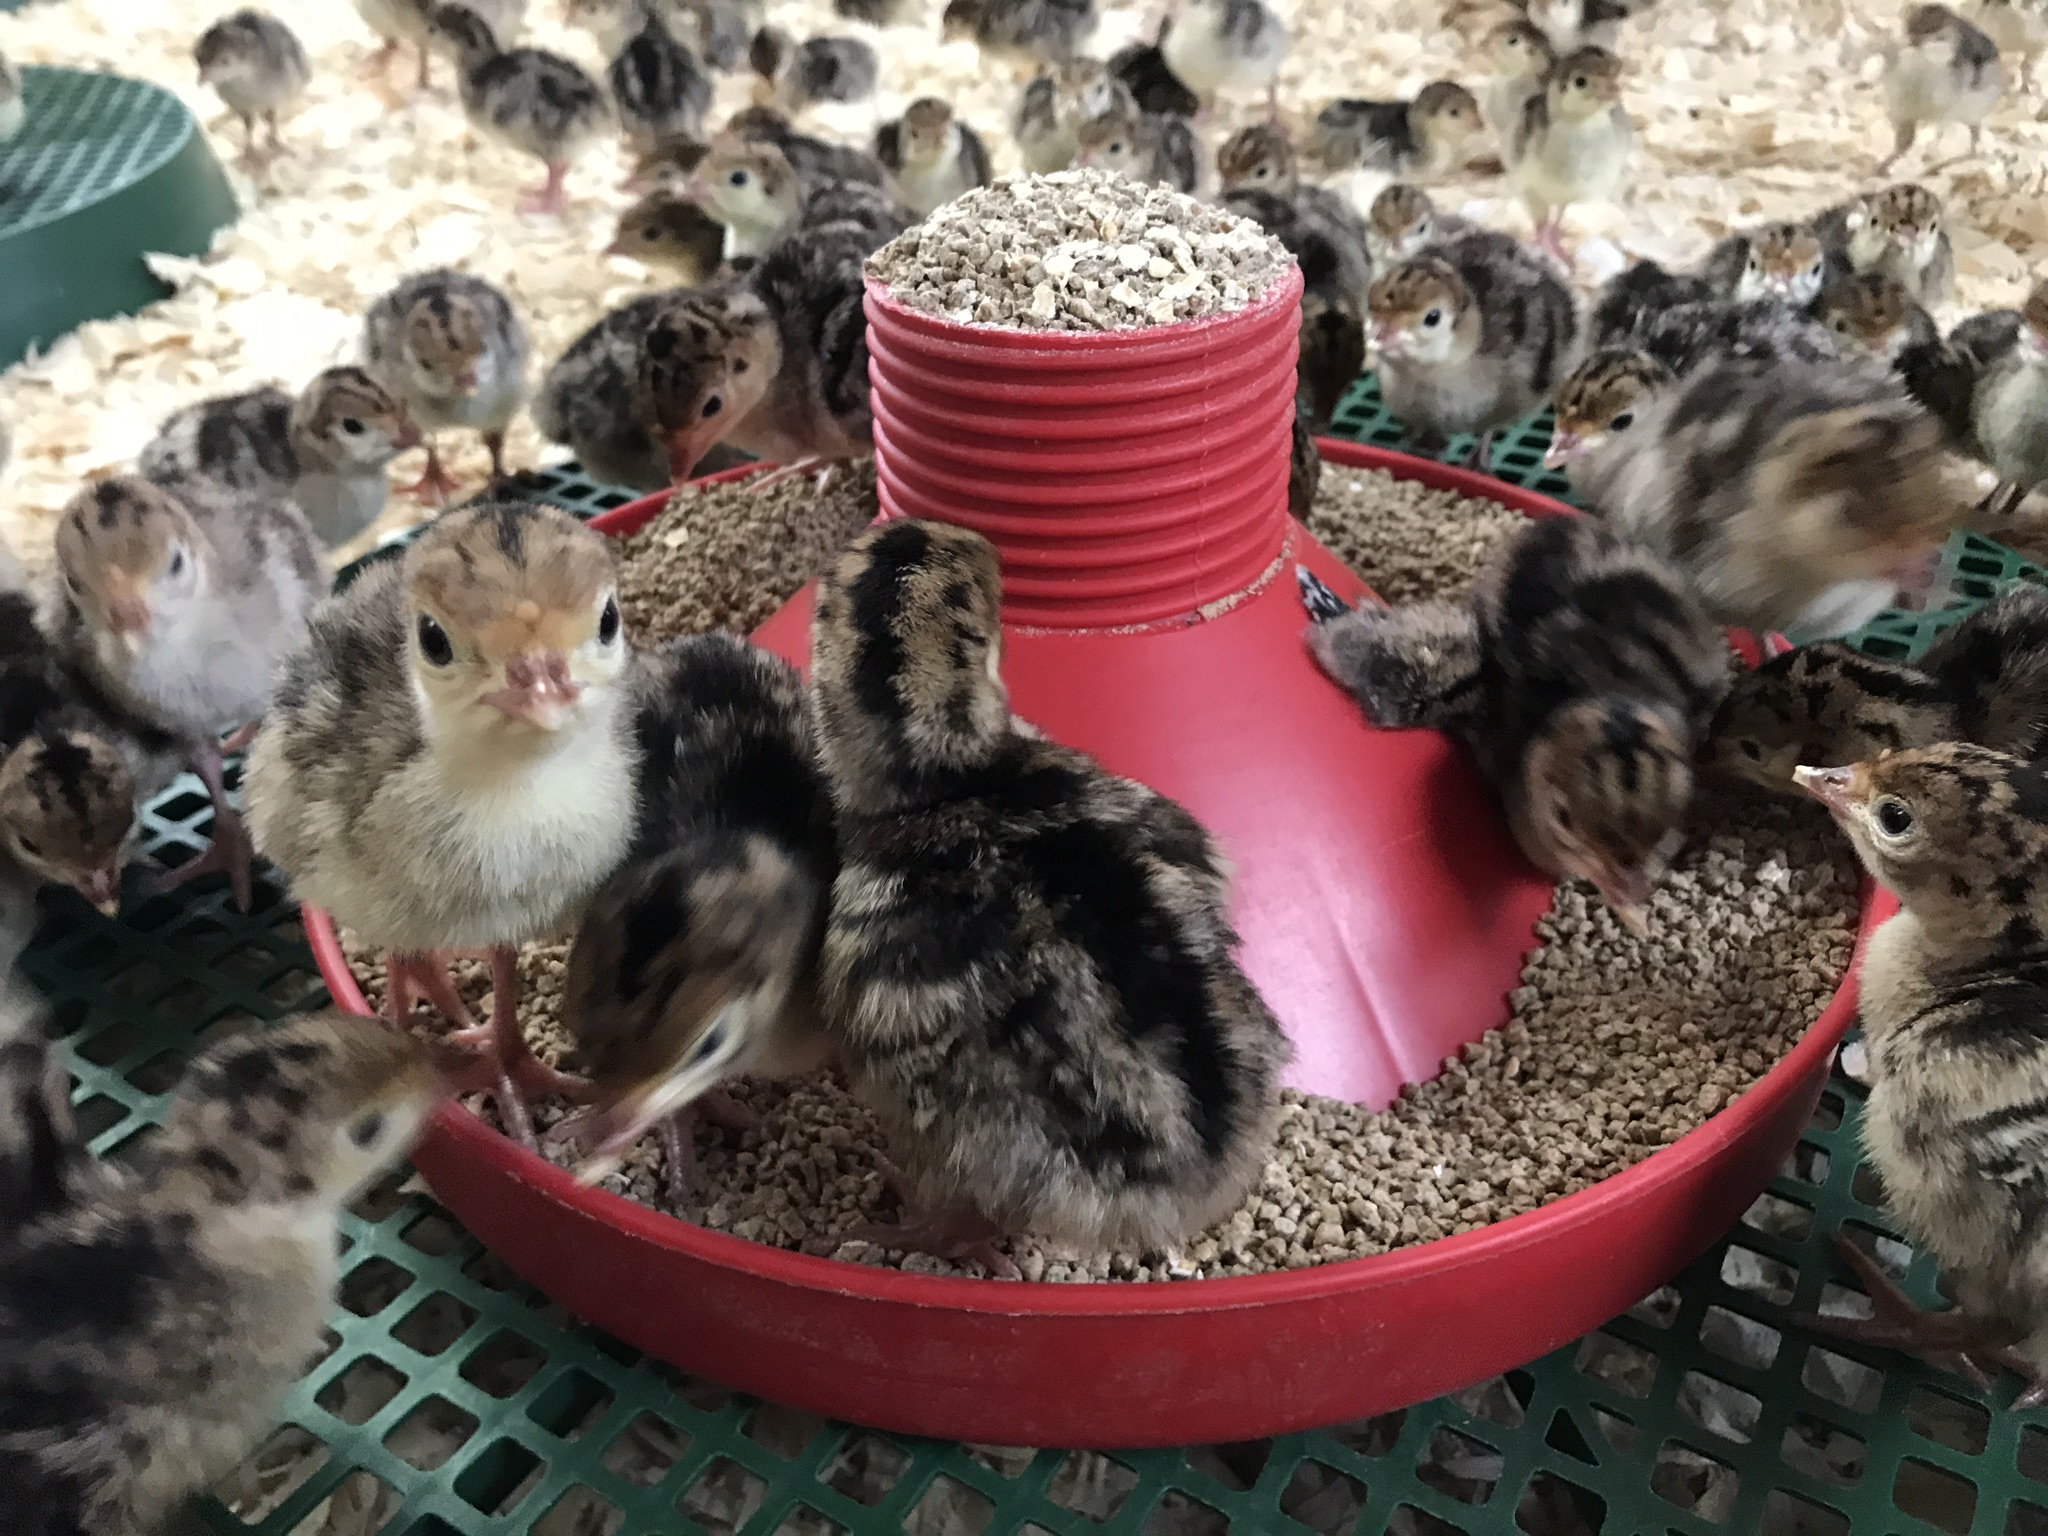 Bramble-farm-bronze-free-range-turkey-chicks-week1-feeding